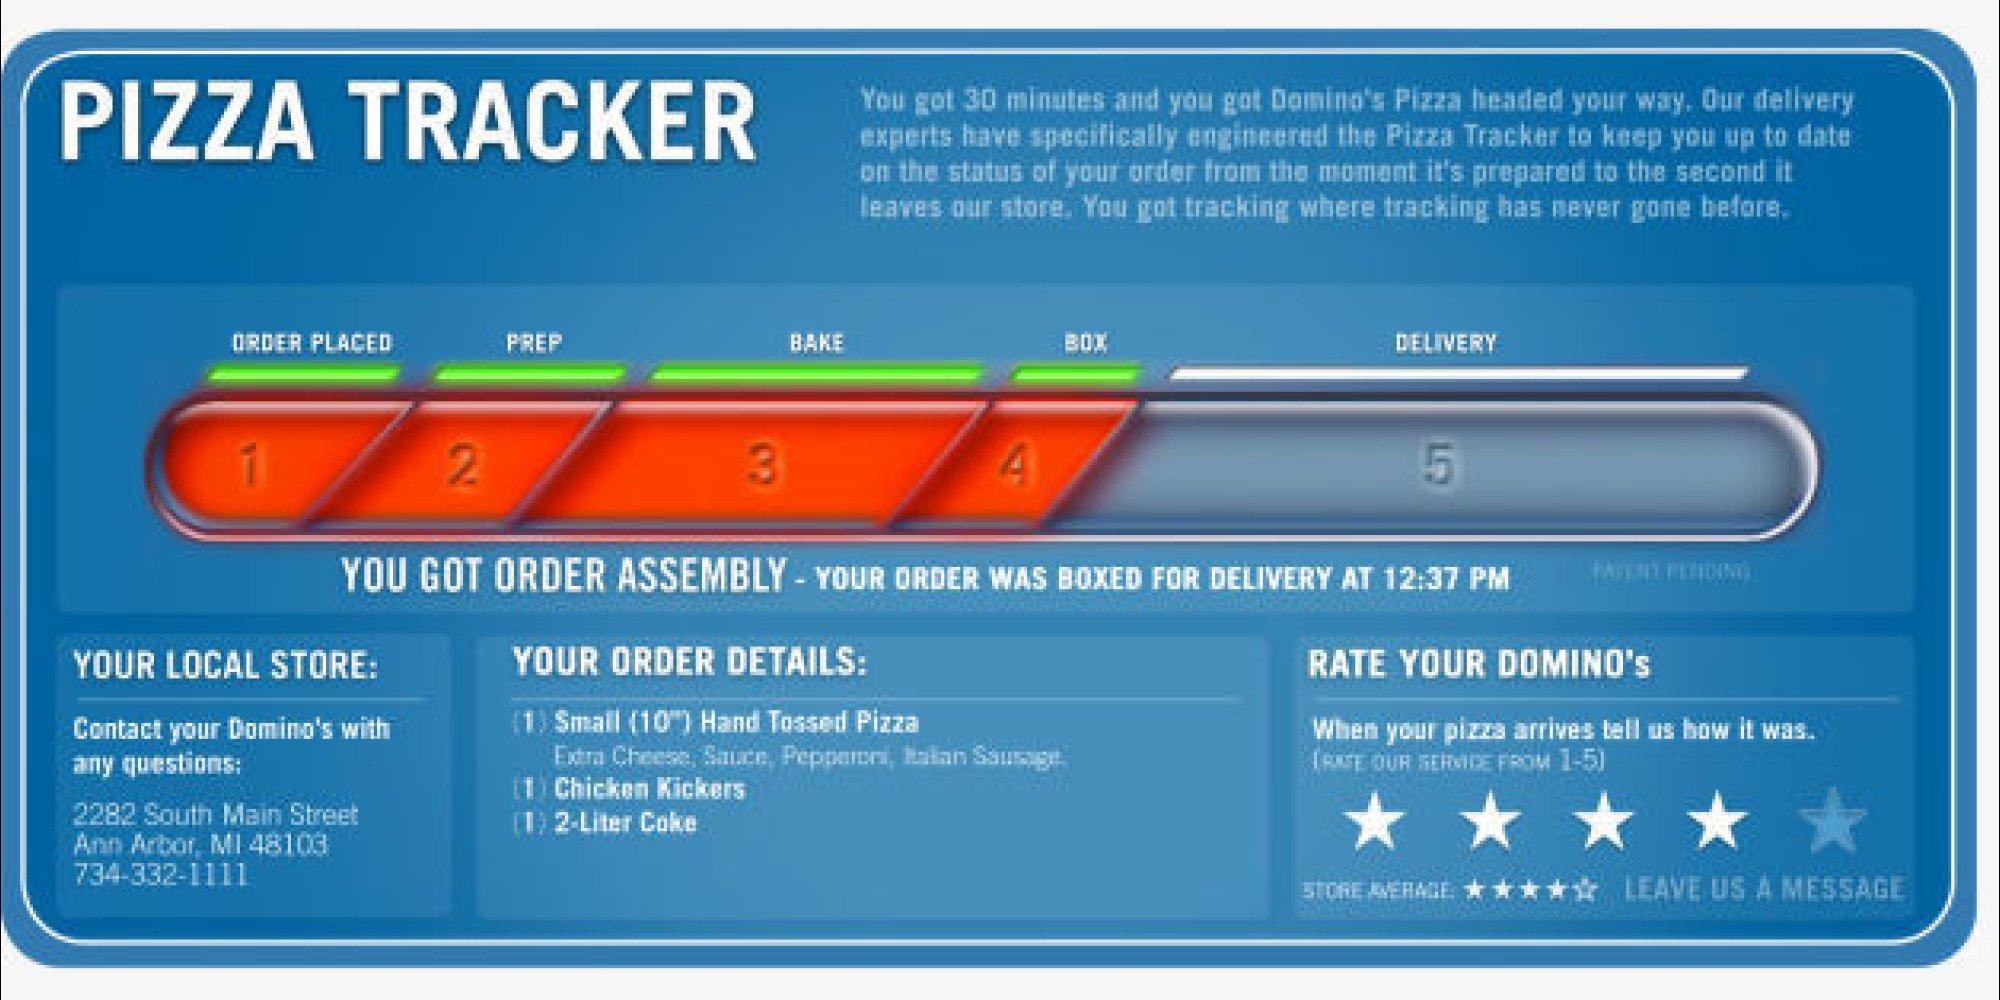 Dominos pizza online order - Dominos Pizza Online Order 8